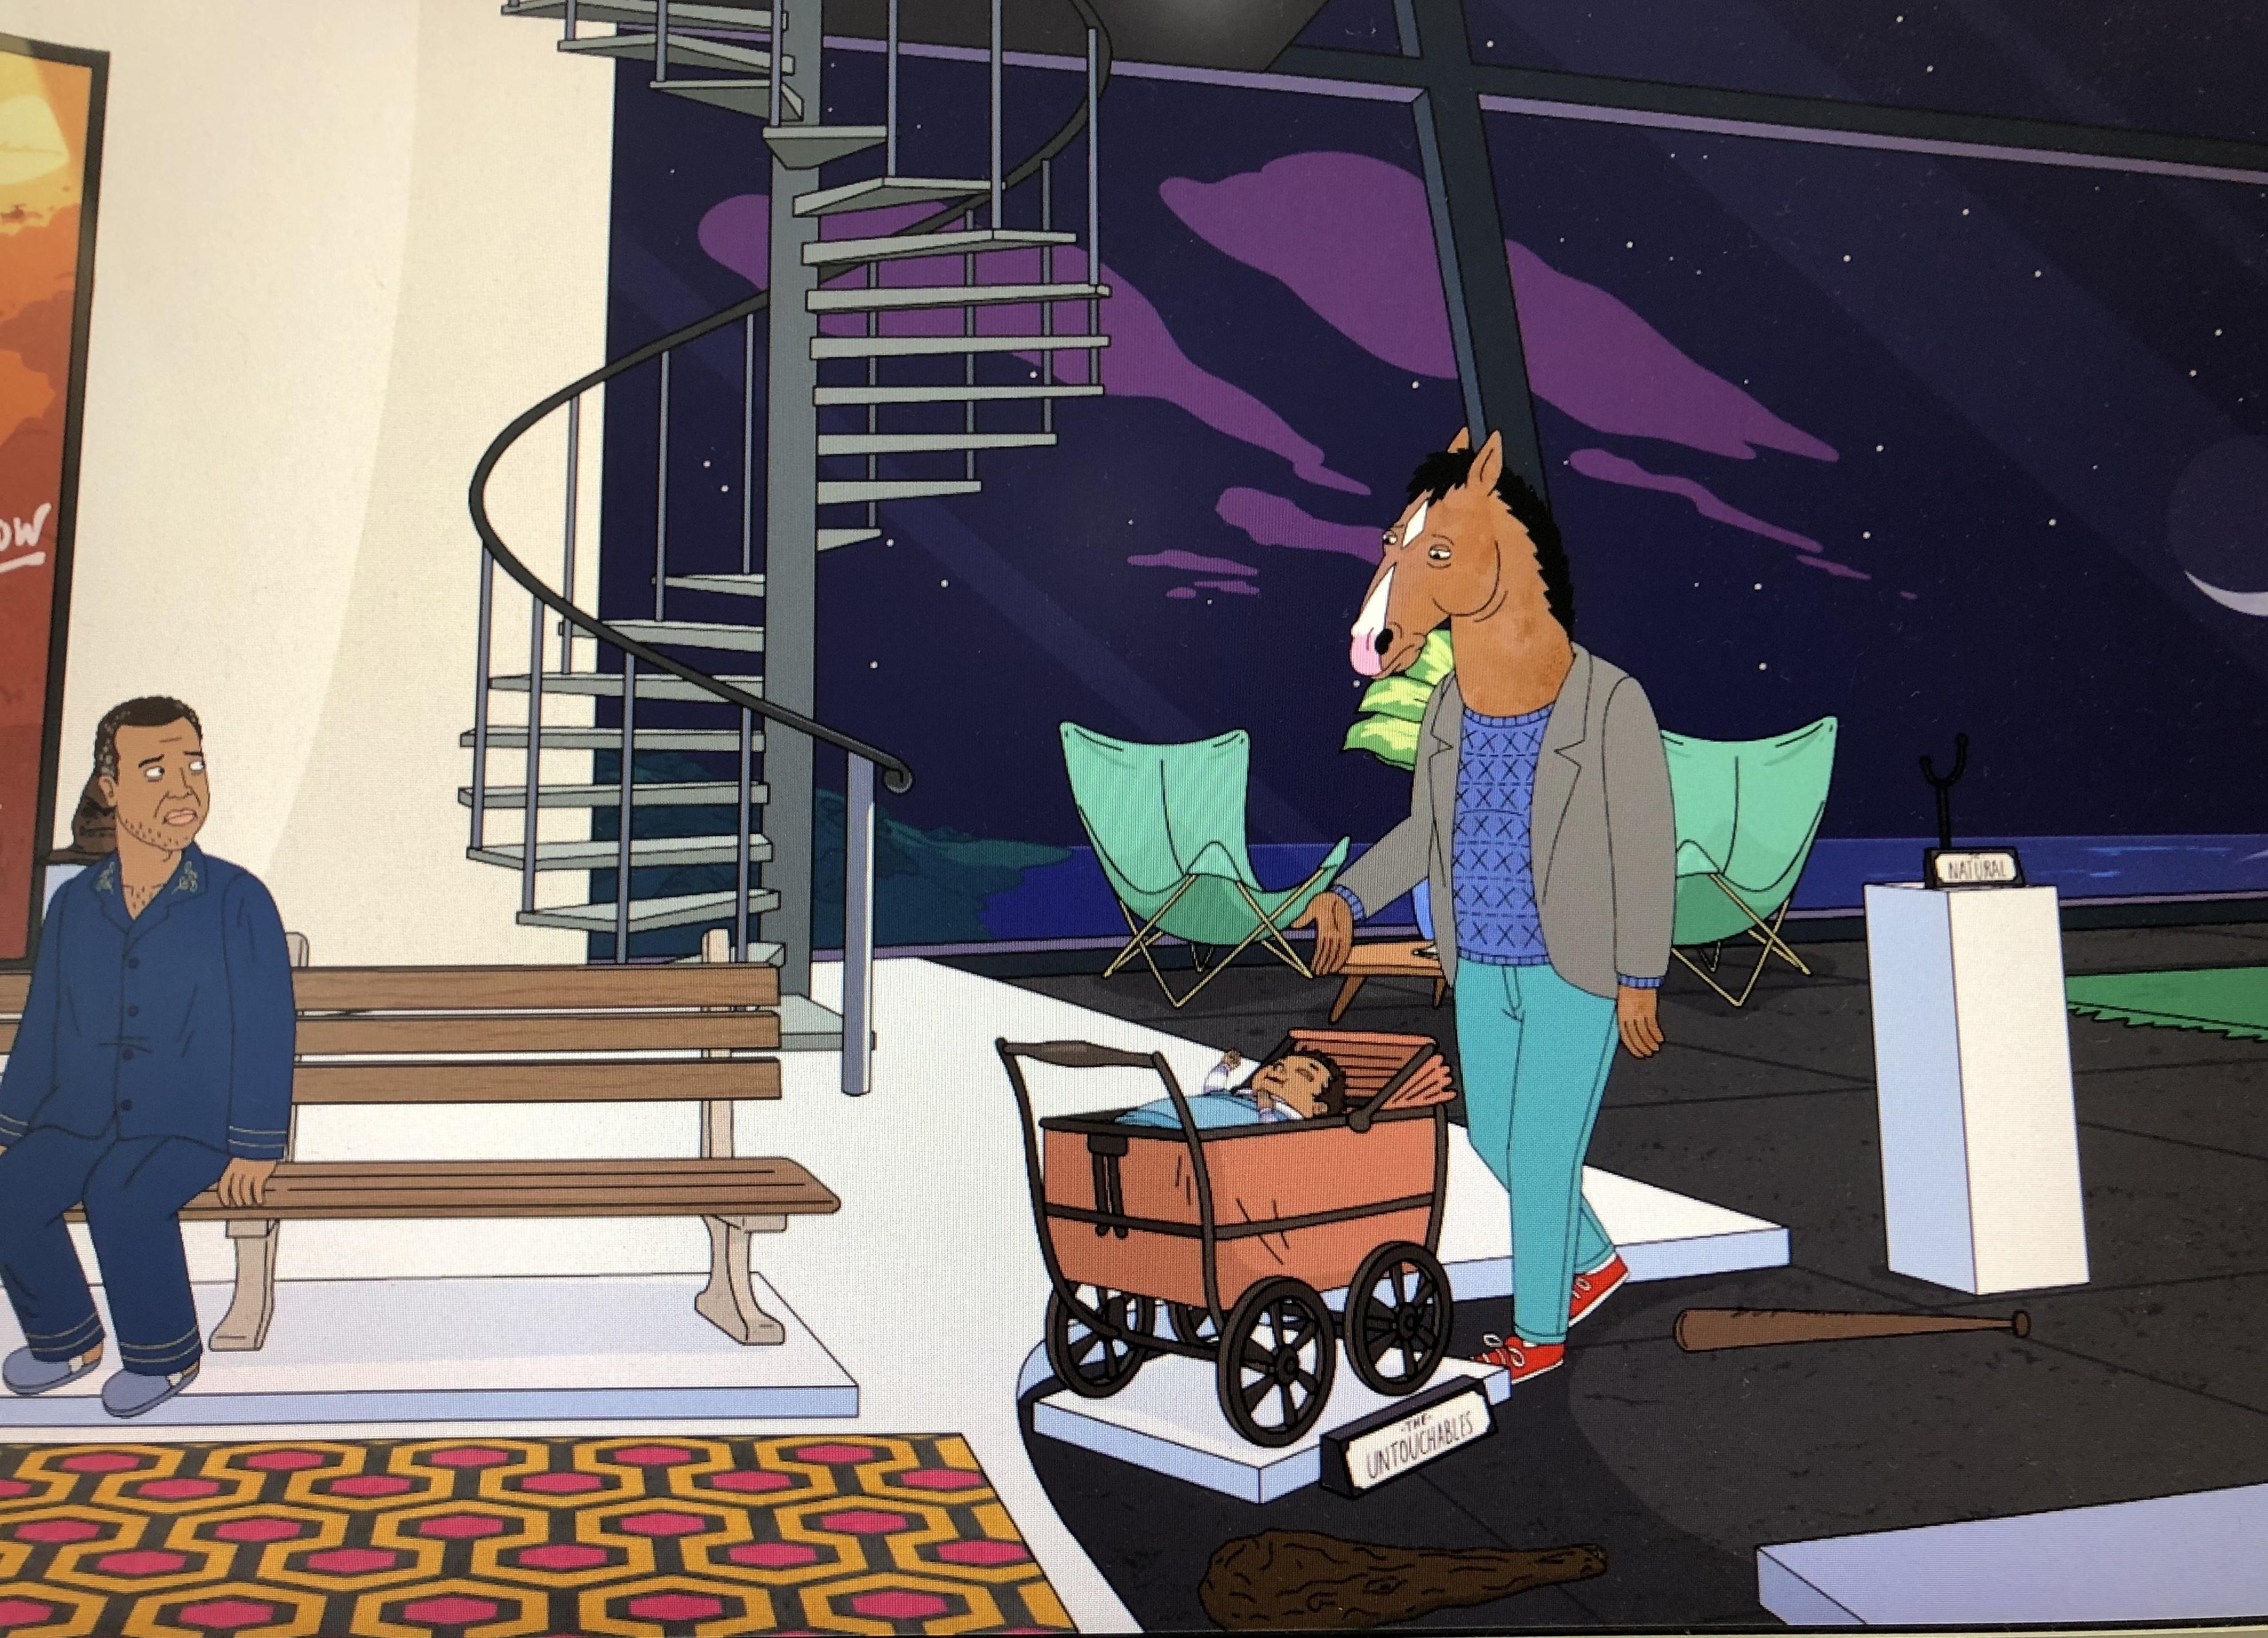 the shining carpet in bojack horseman